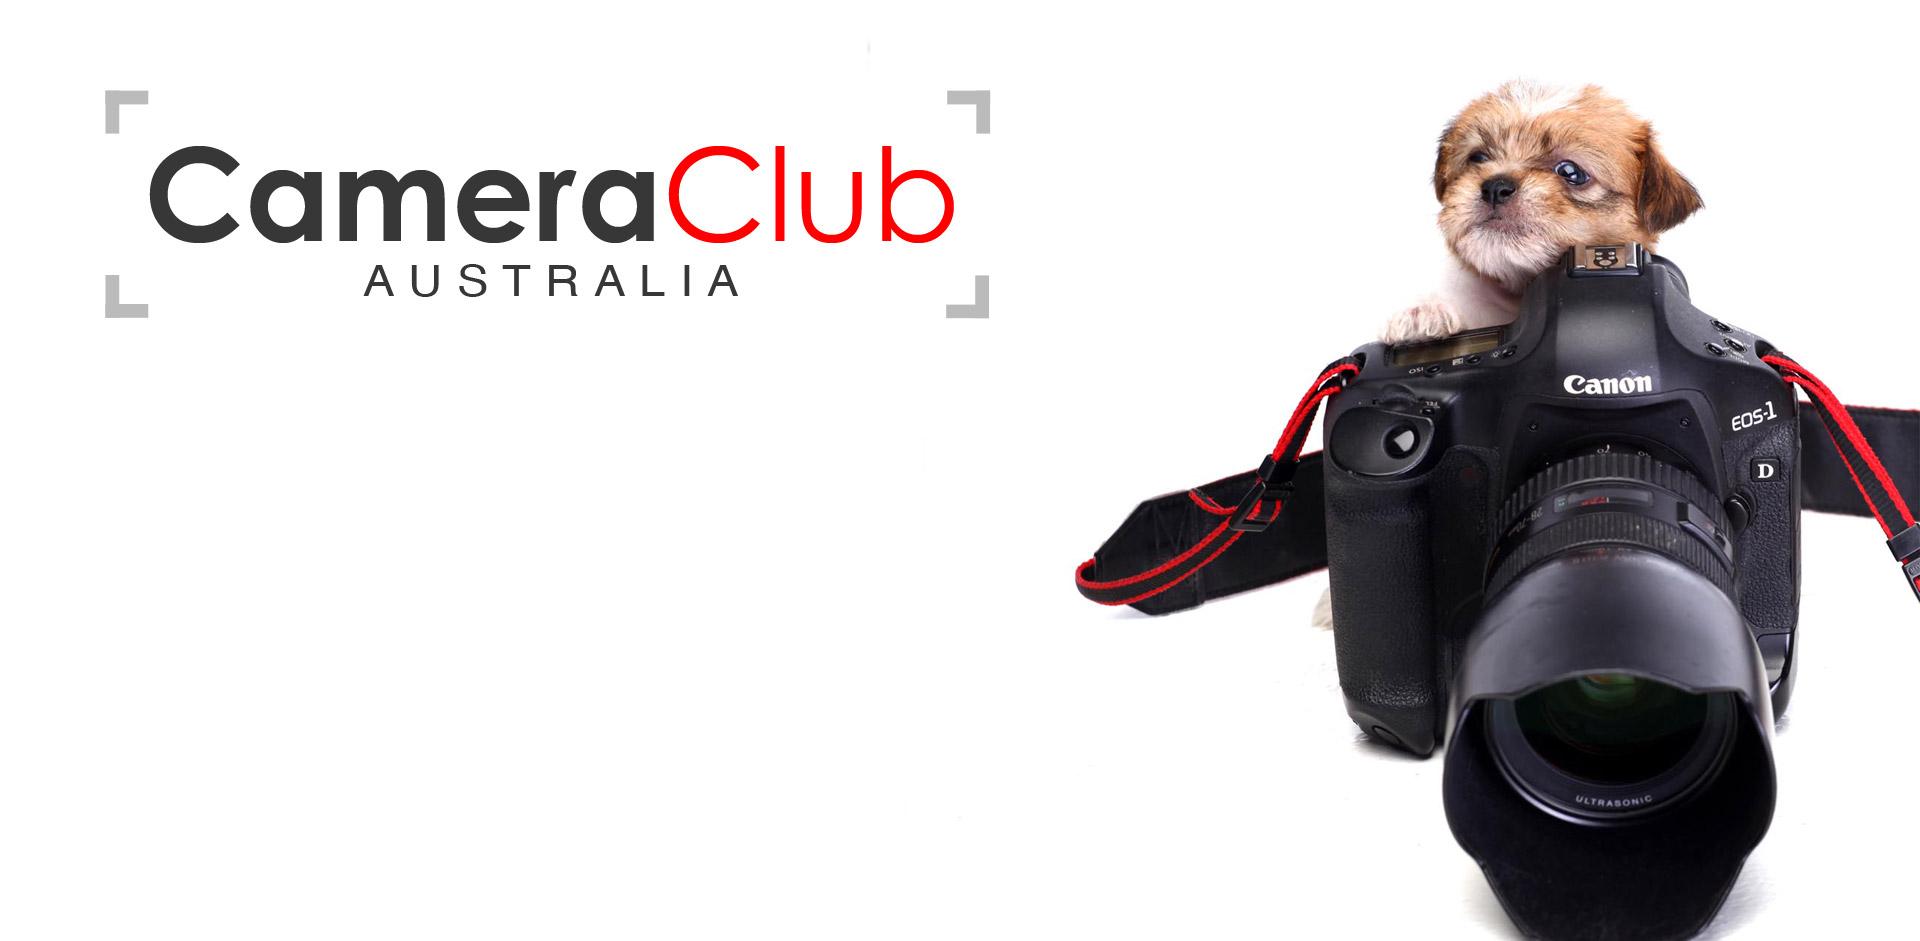 Camera Club Australia